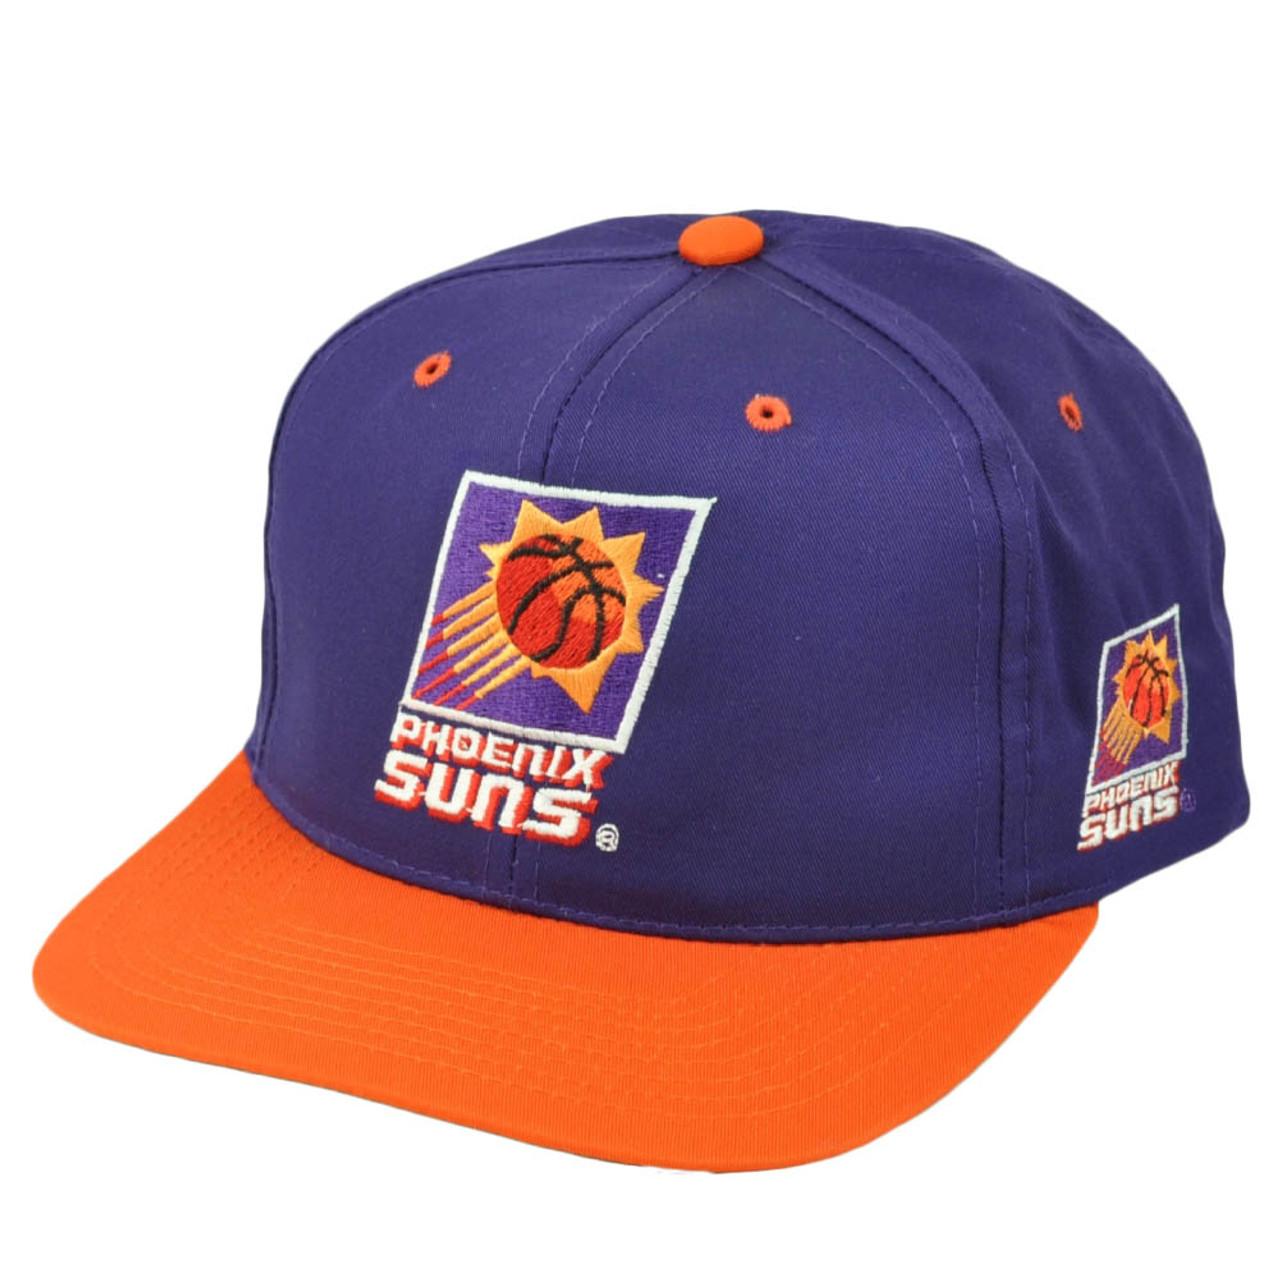 8bd8fe22be8 Phoenix Suns Mens Vintage Old School Hat Cap Purple Orange Snapback  Basketball - Cap Store Online.com